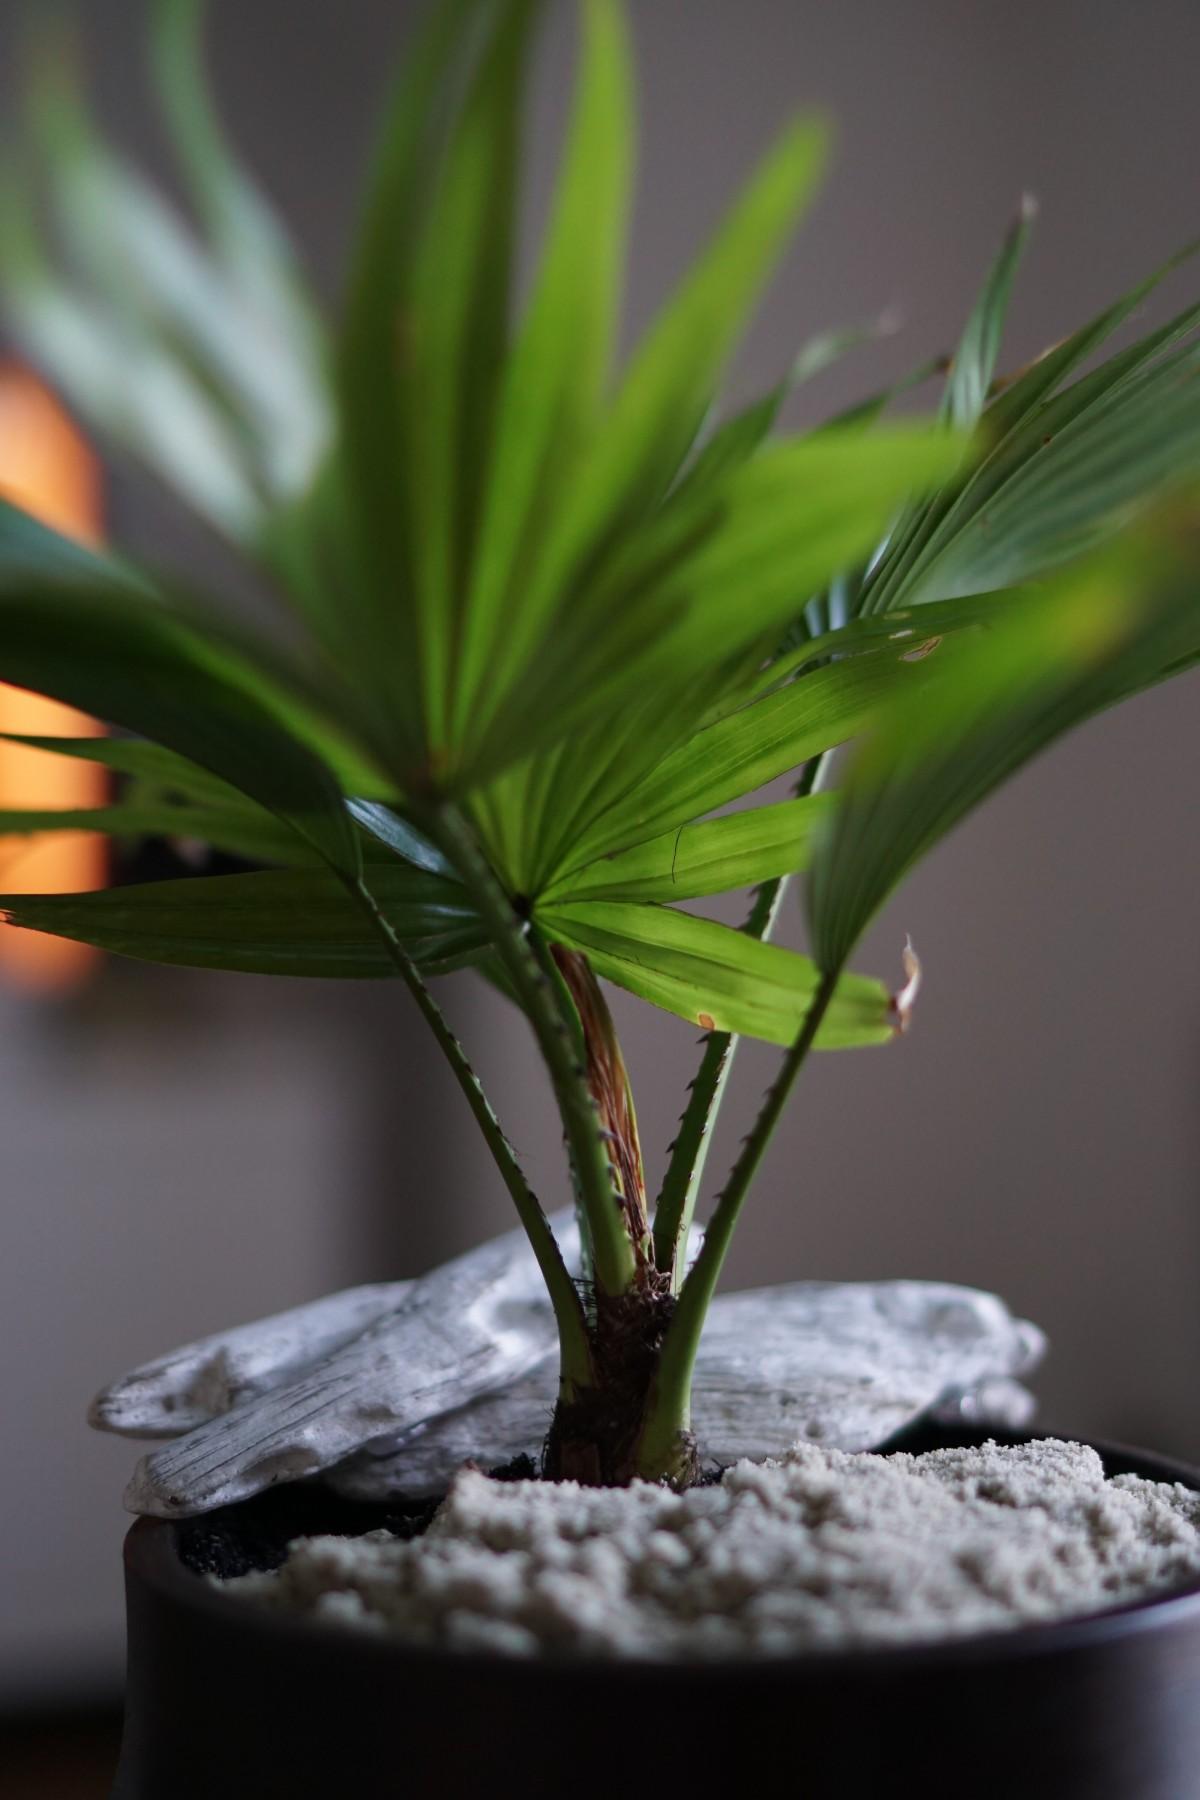 images gratuites les plantes vert fond blanc. Black Bedroom Furniture Sets. Home Design Ideas